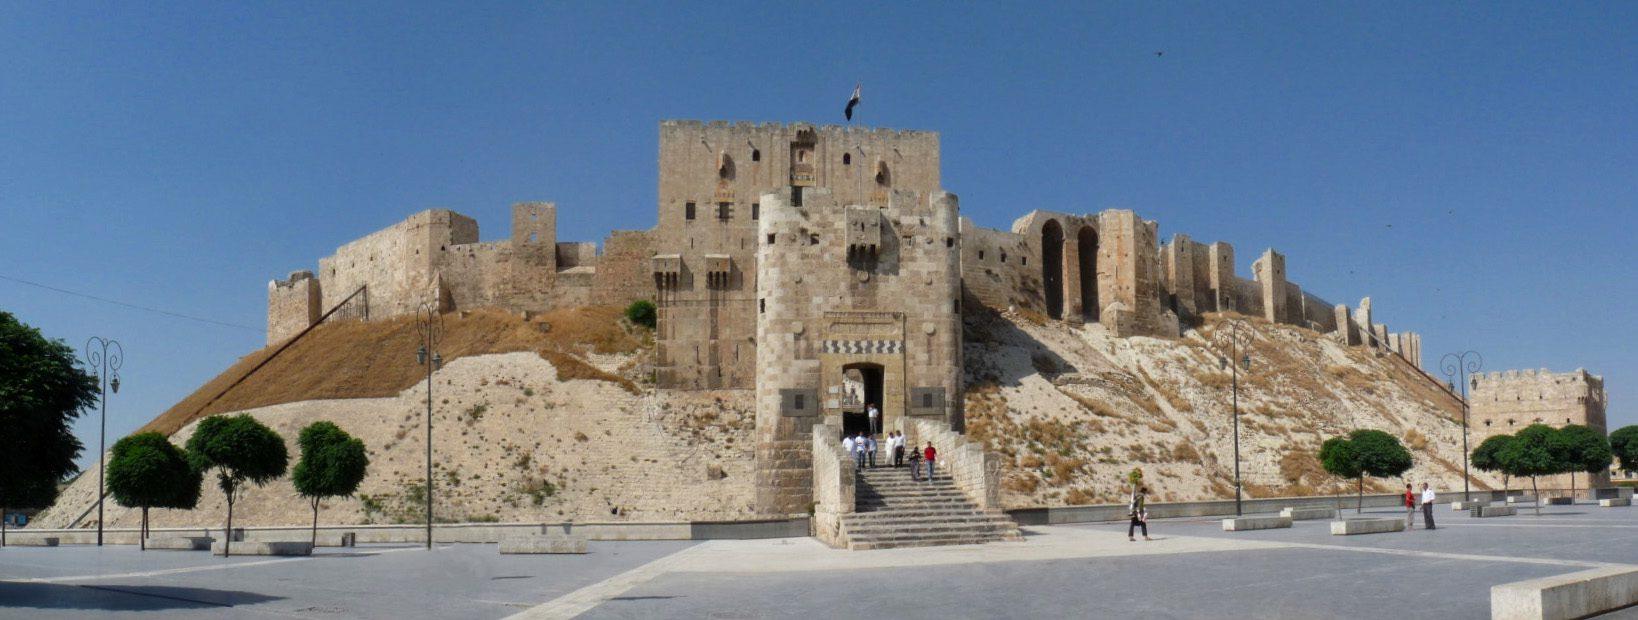 Citadel_of_Aleppo